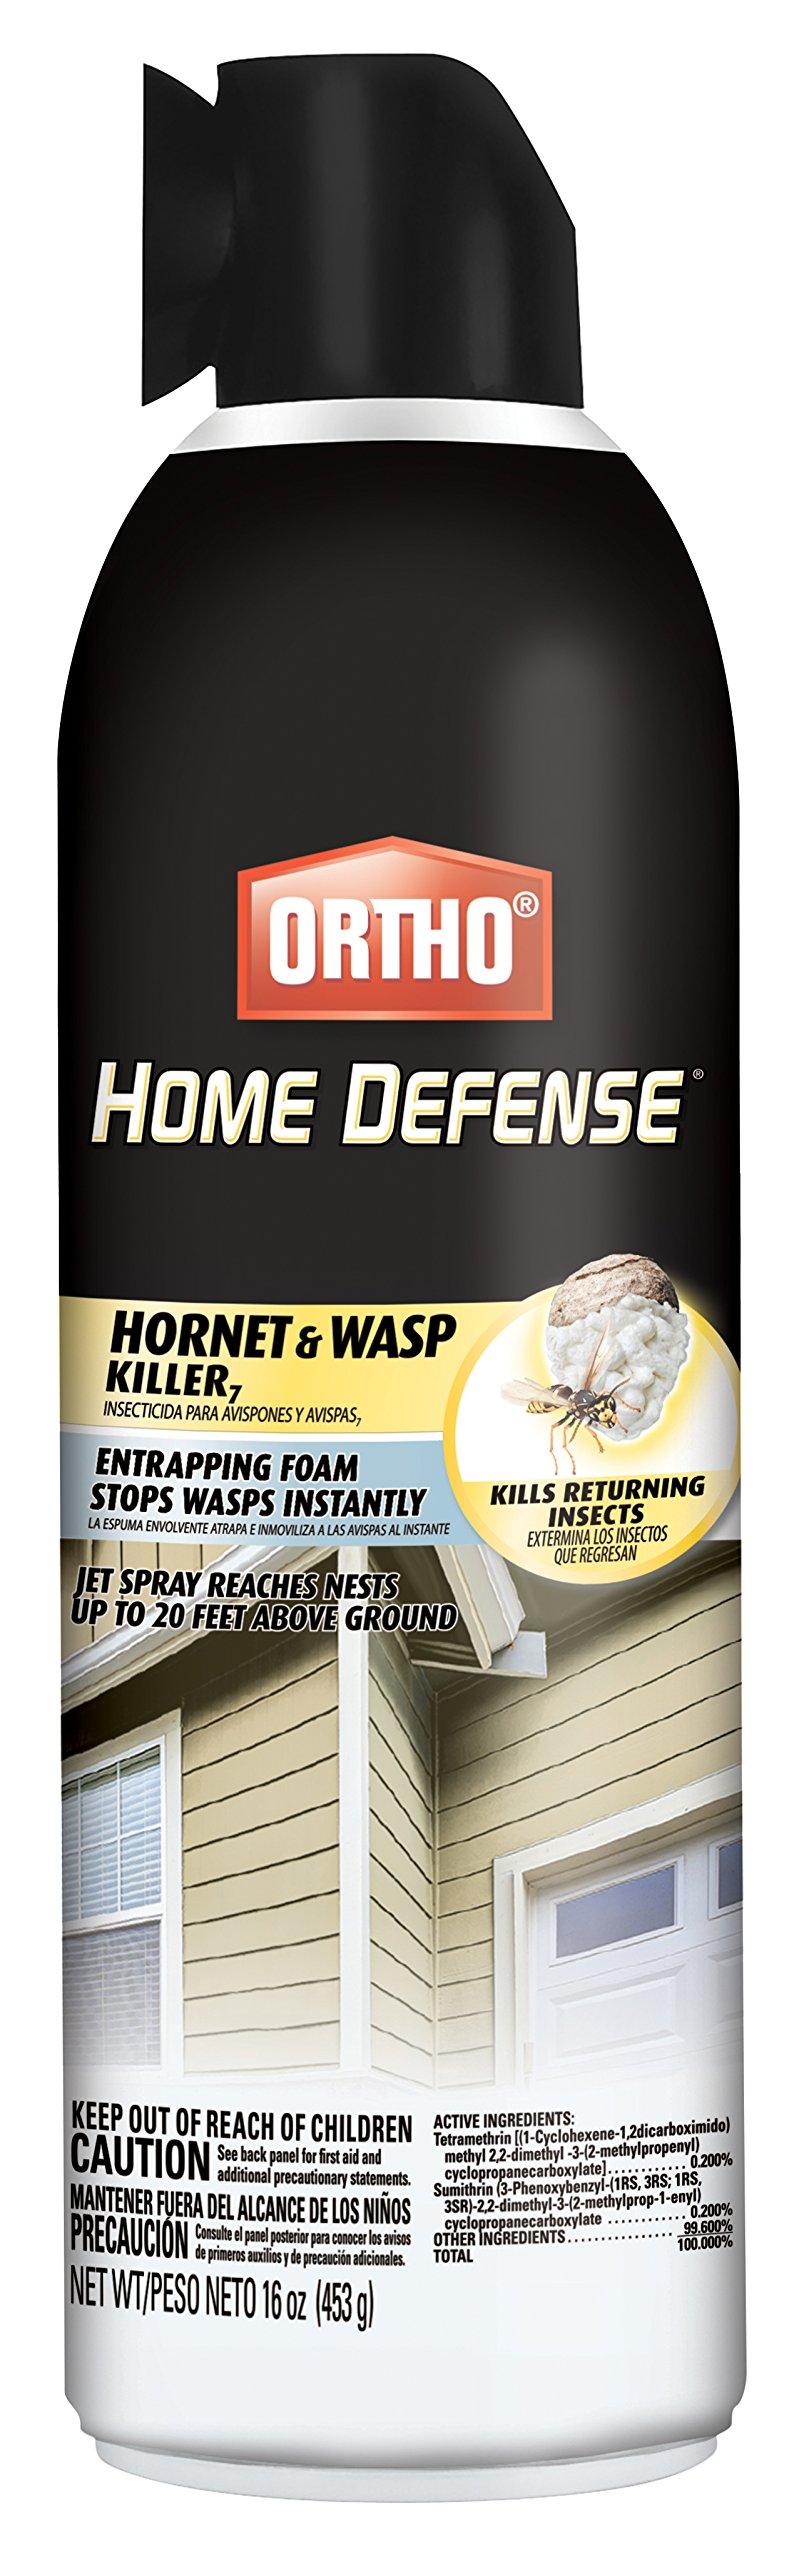 Ortho Home Defense Hornet & Wasp Killer7, 16 Oz